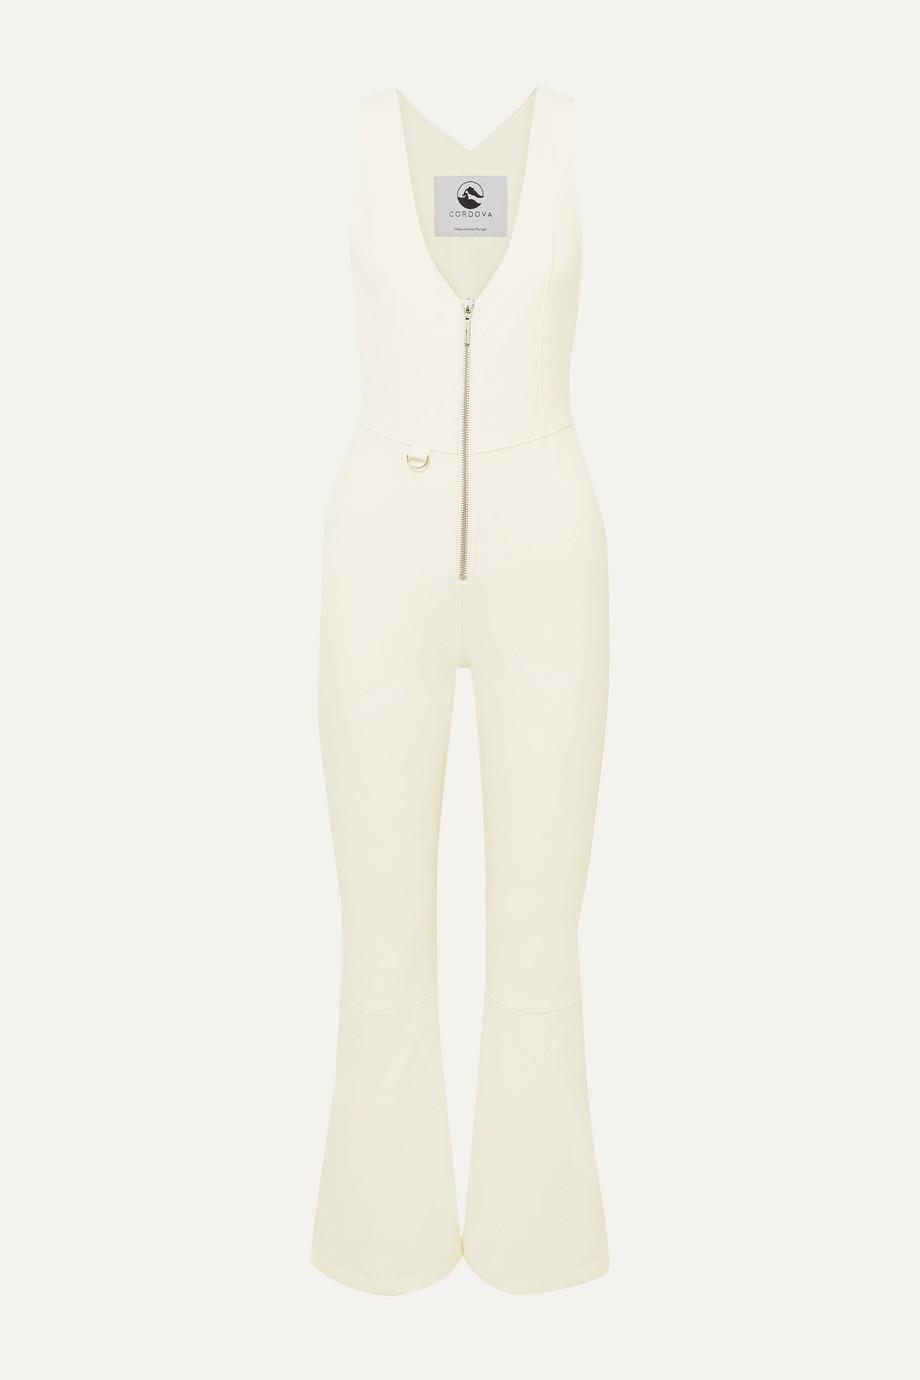 Cordova The Taos stretch ski suit